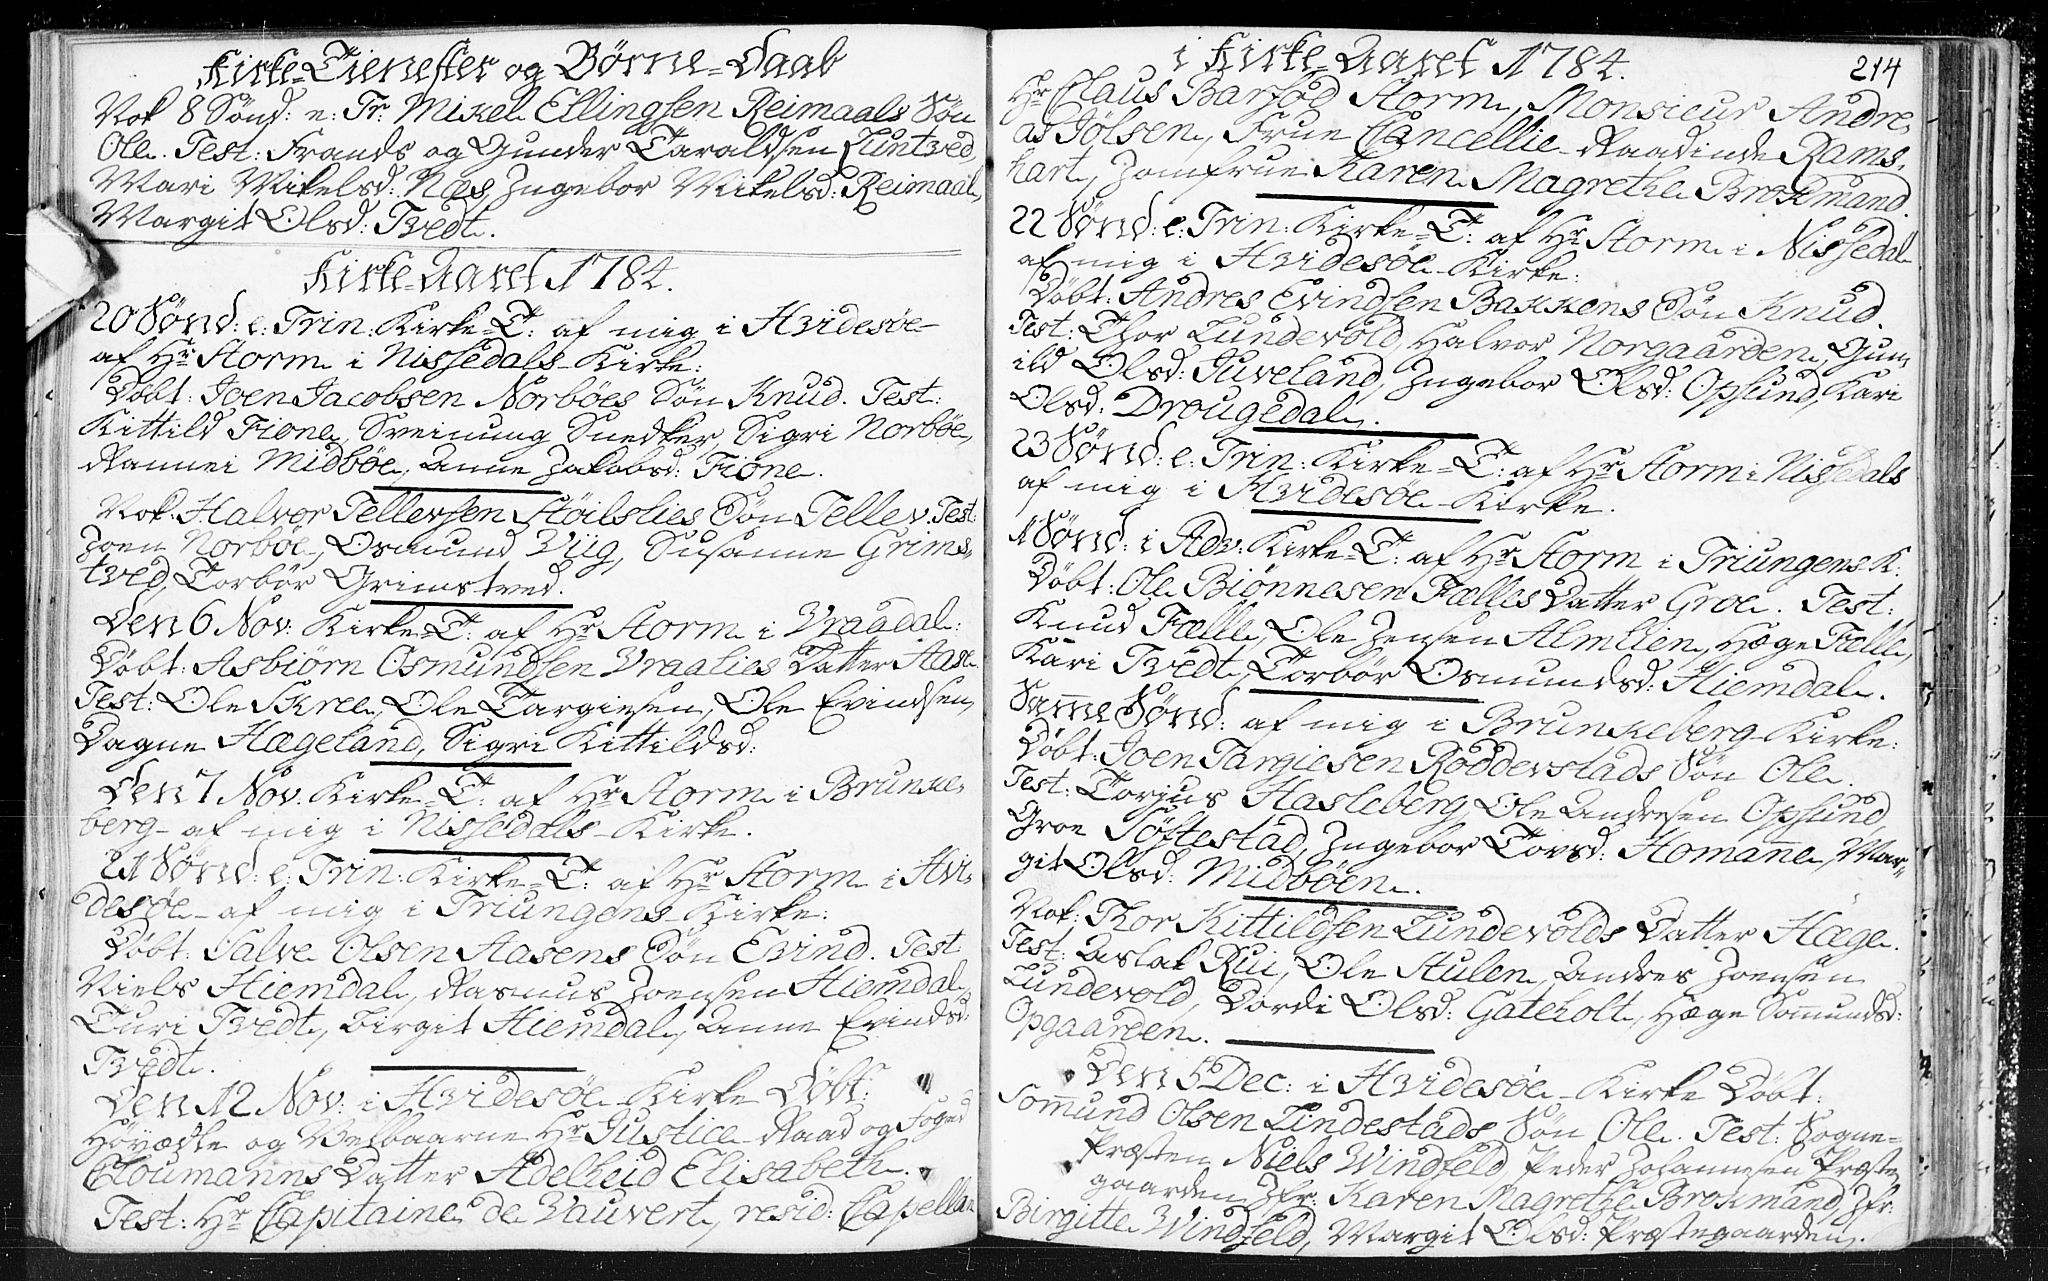 SAKO, Kviteseid kirkebøker, F/Fa/L0002: Parish register (official) no. I 2, 1773-1786, p. 214